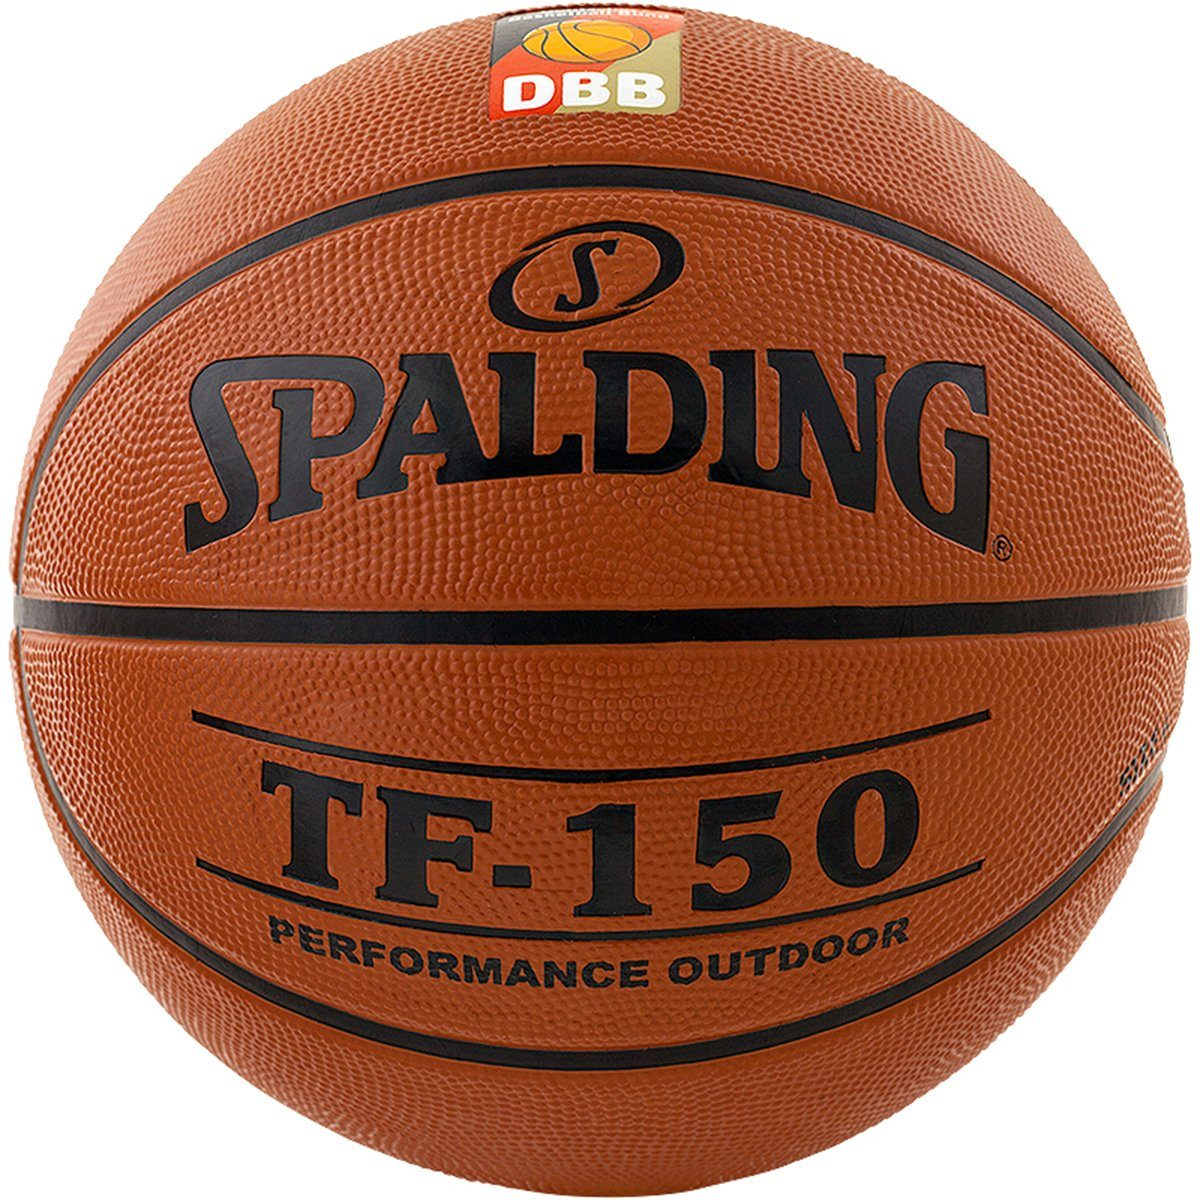 SPALDING TF150 DBB Outdoor Basketball